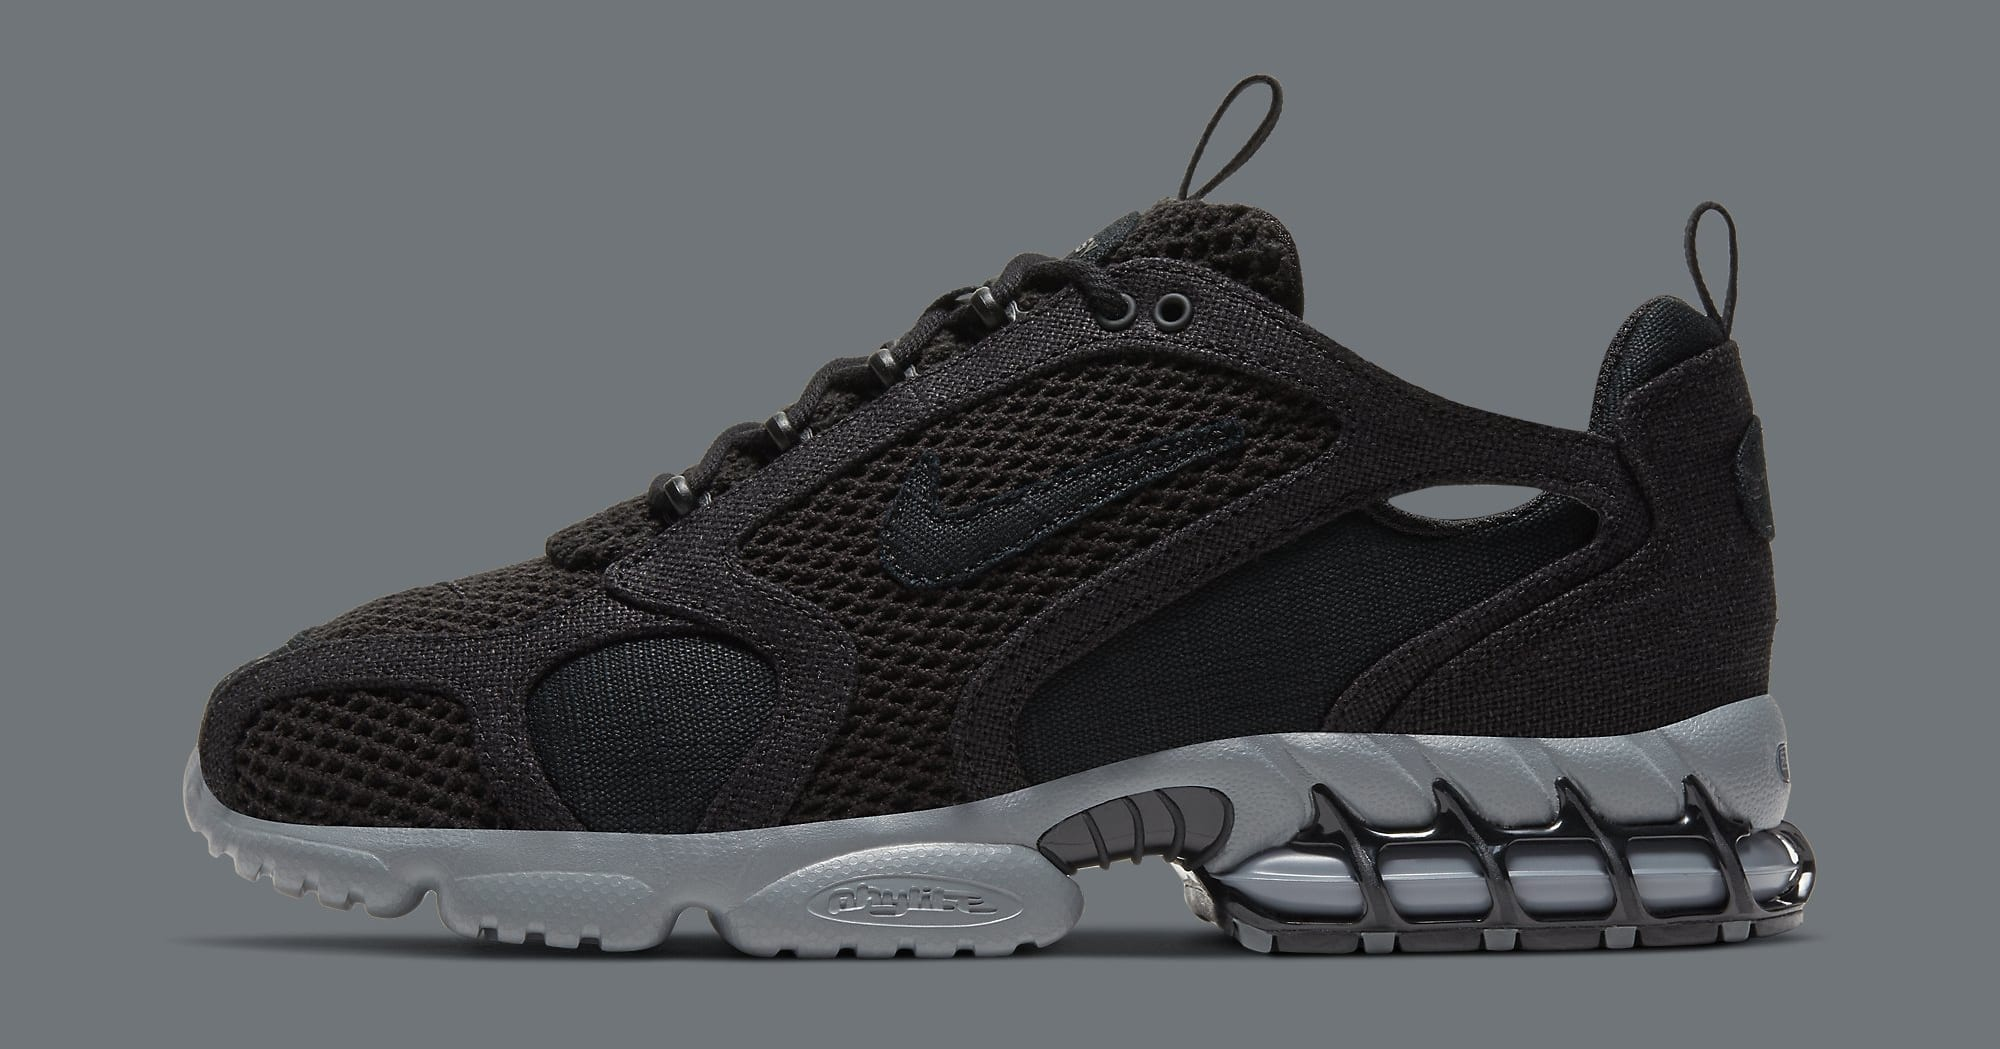 Stussy x Nike Air Zoom Spiridon Cage 2 CQ5486-001 Lateral